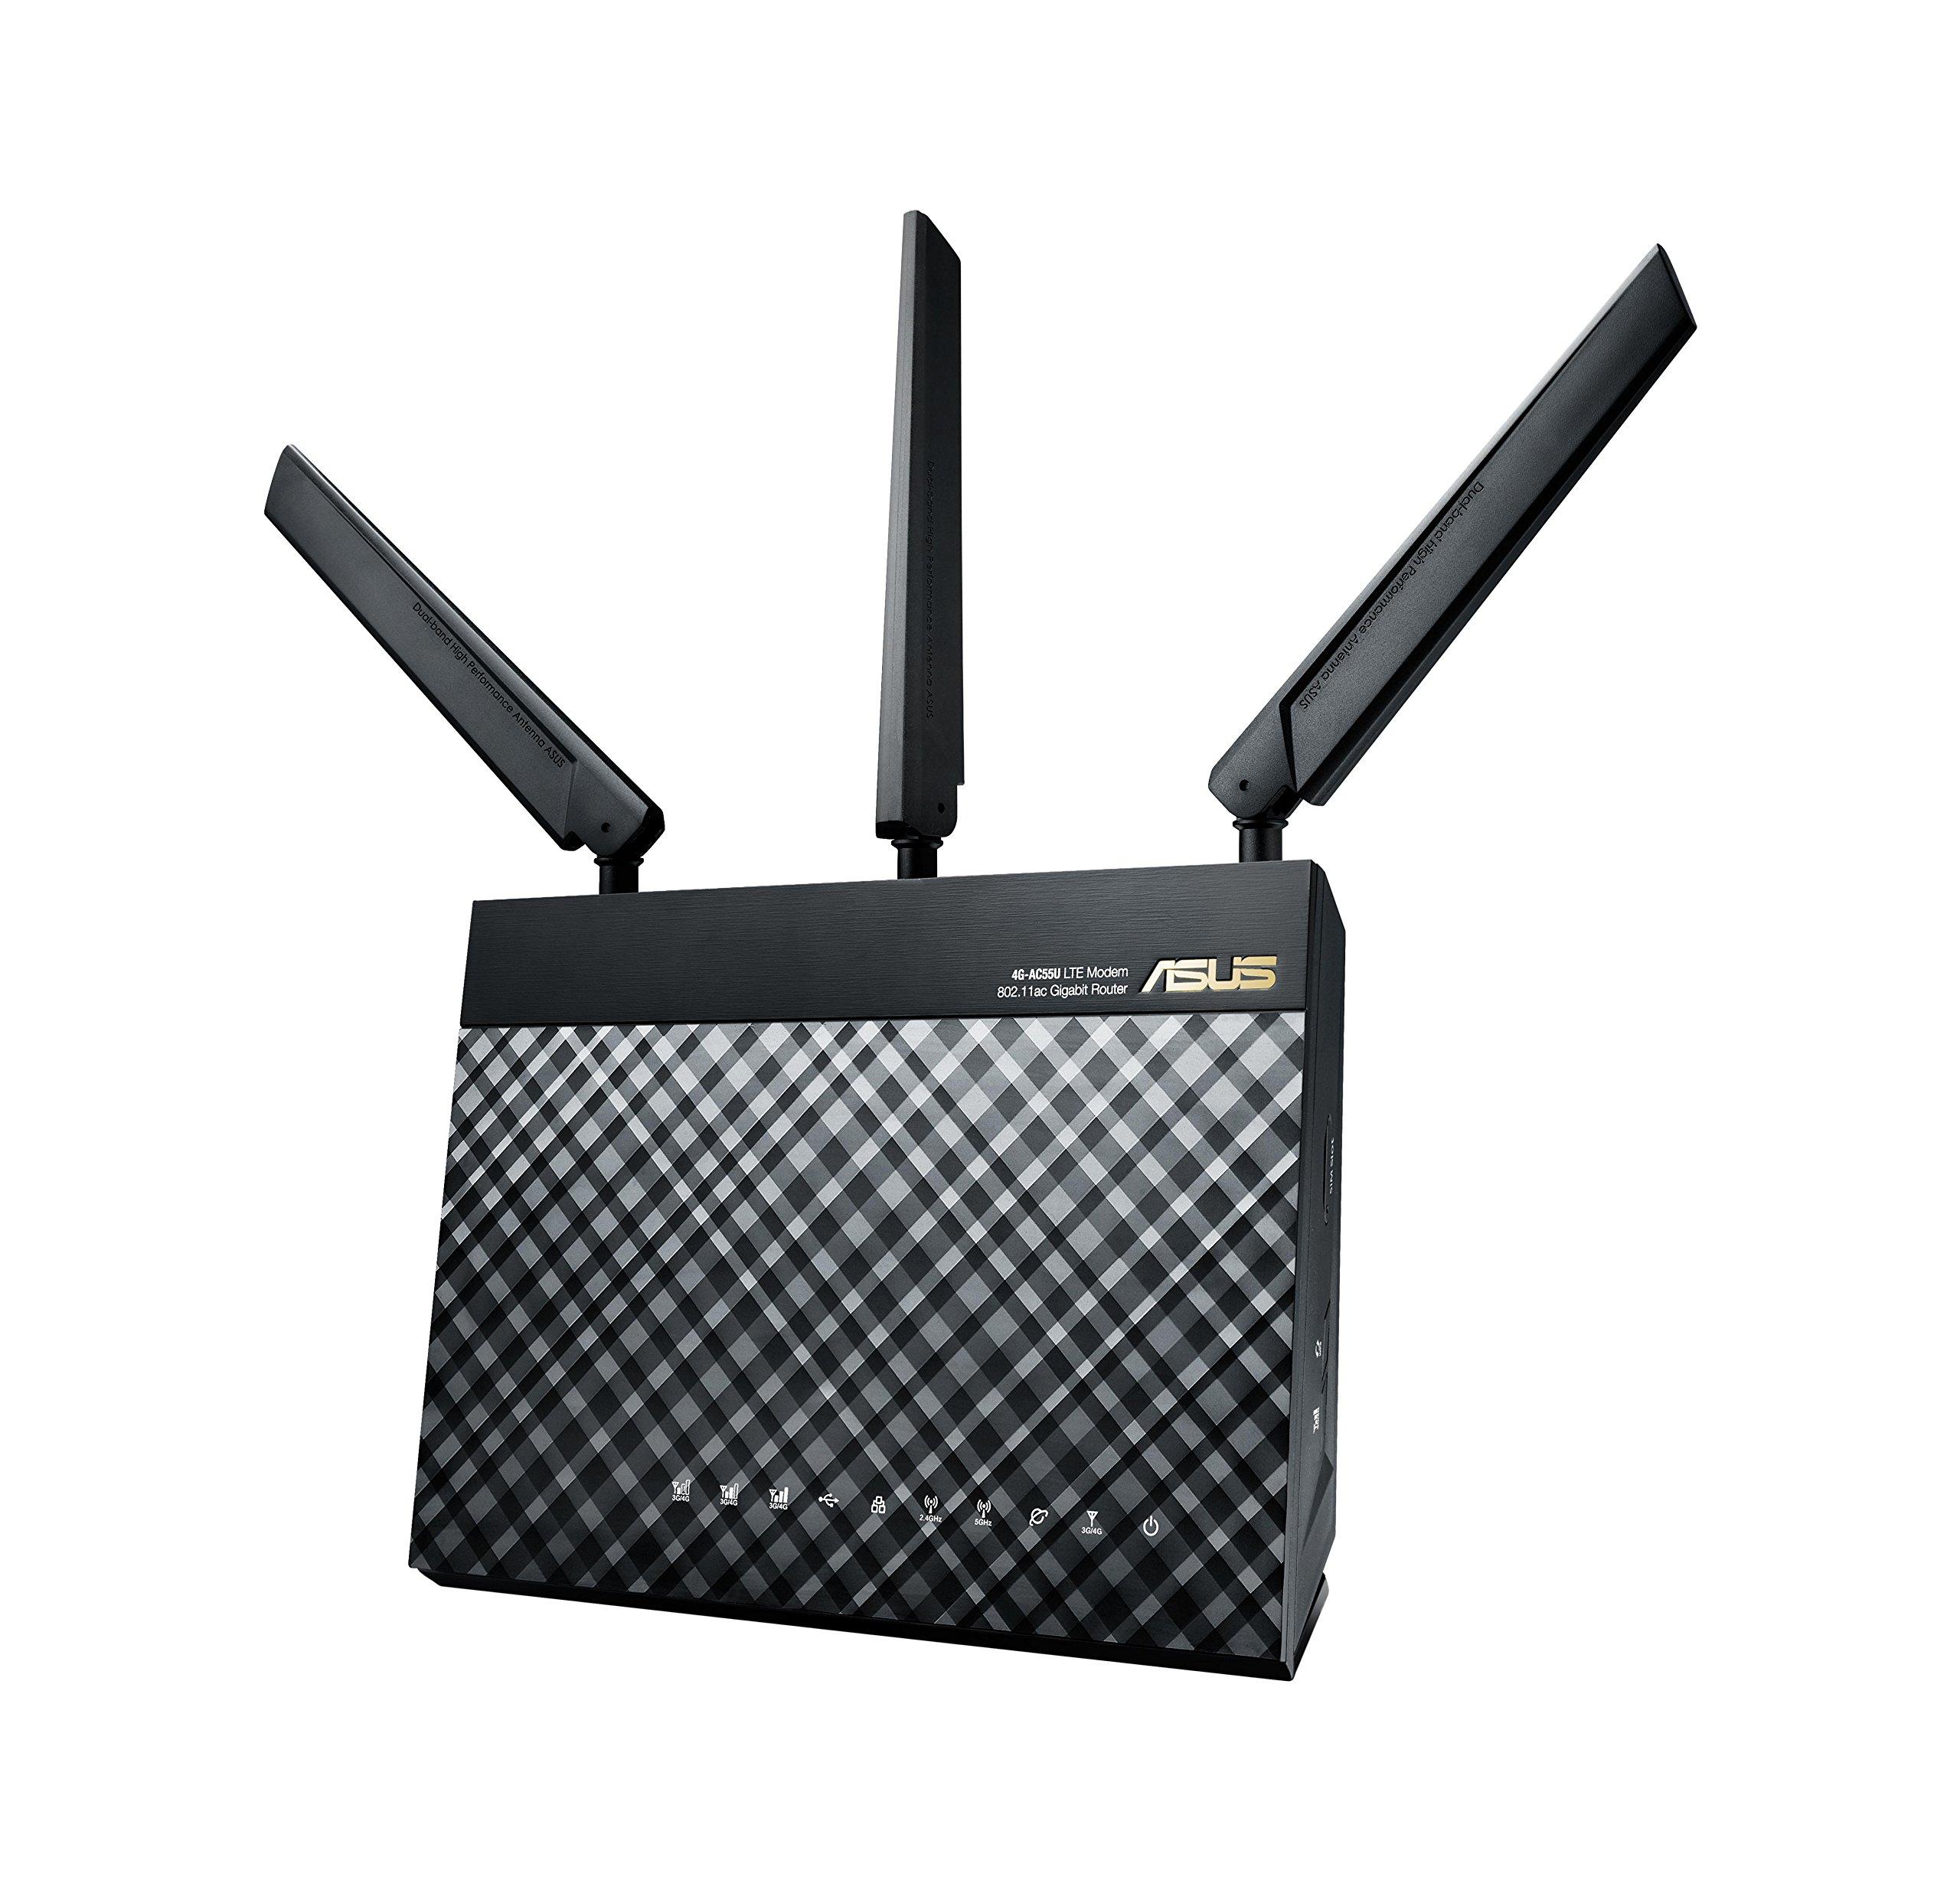 Asus 4G-AC55U AC1200 LTE WIRELESS-AC1200 LTE MODEM, 90IG01H0-BM3000 (WIRELESS-AC1200 LTE MODEM)